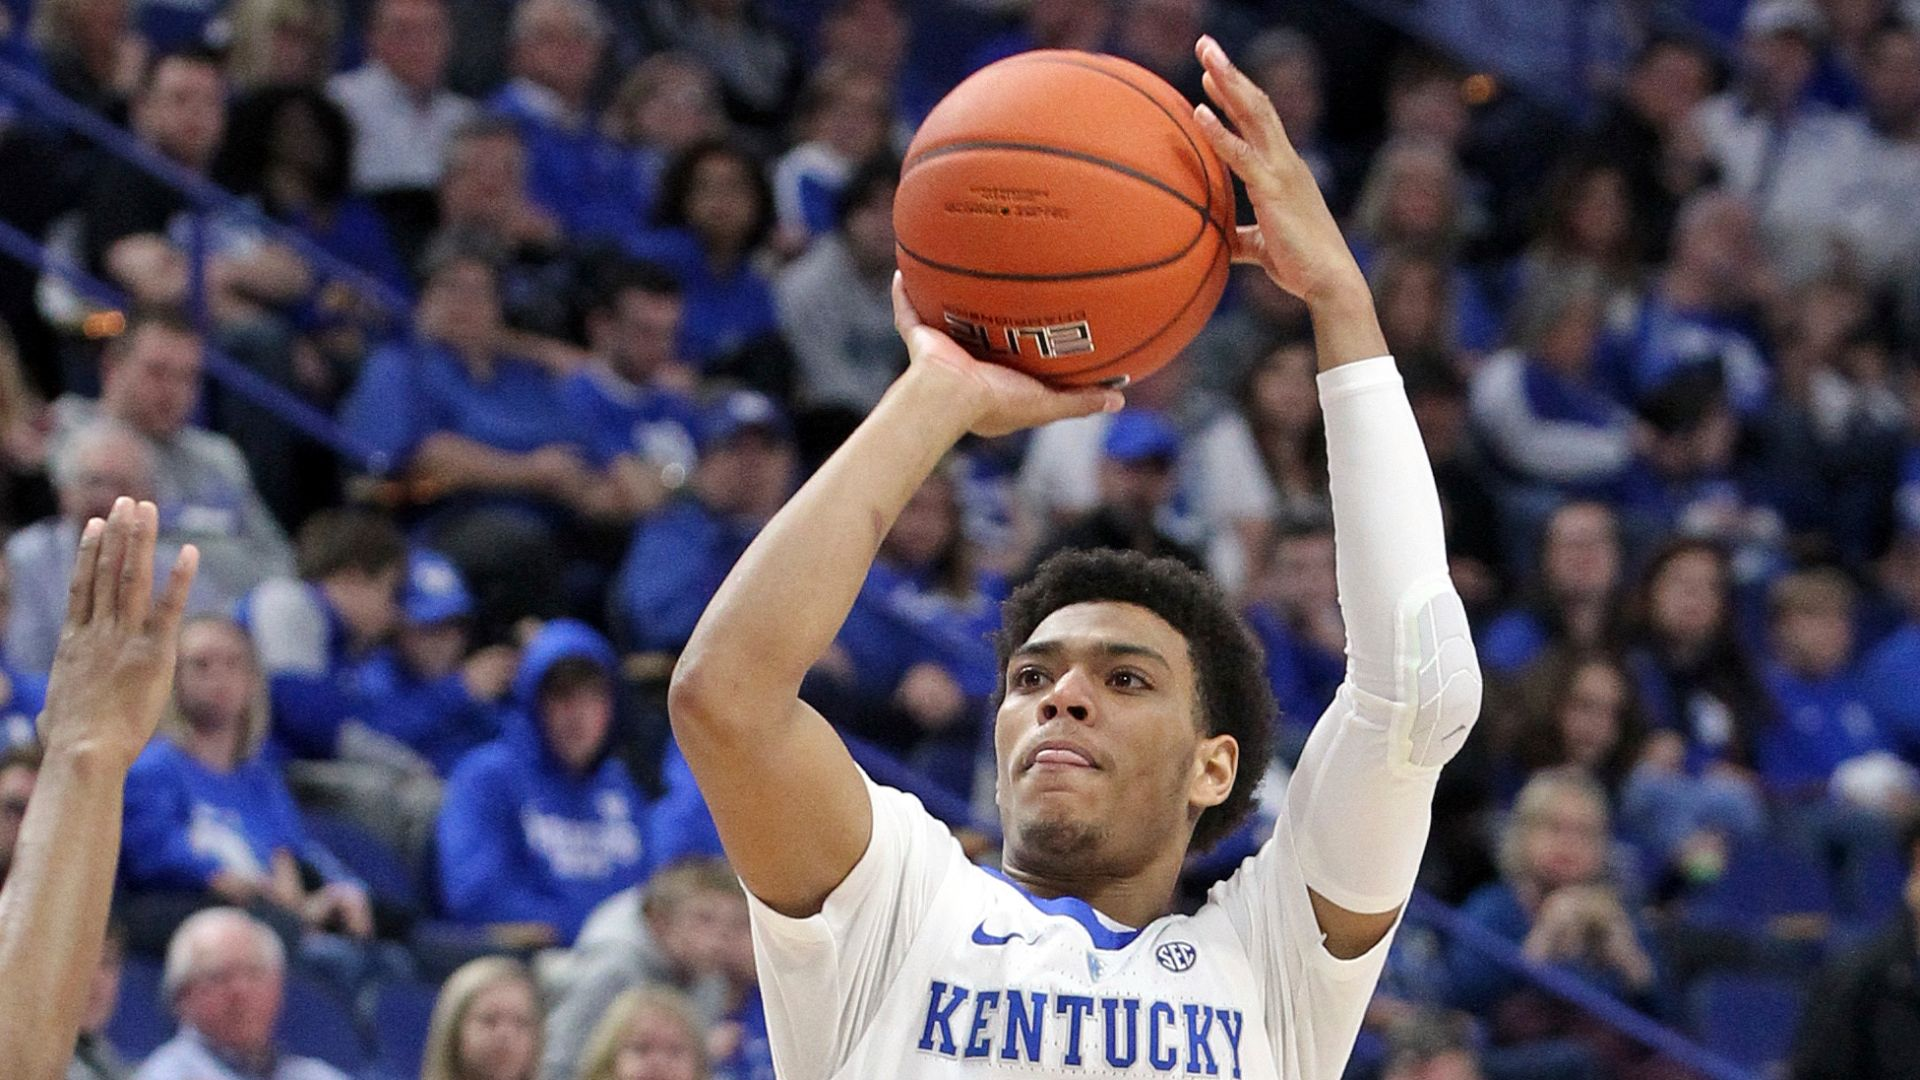 Borzello: Green can still make an impact in college basketball